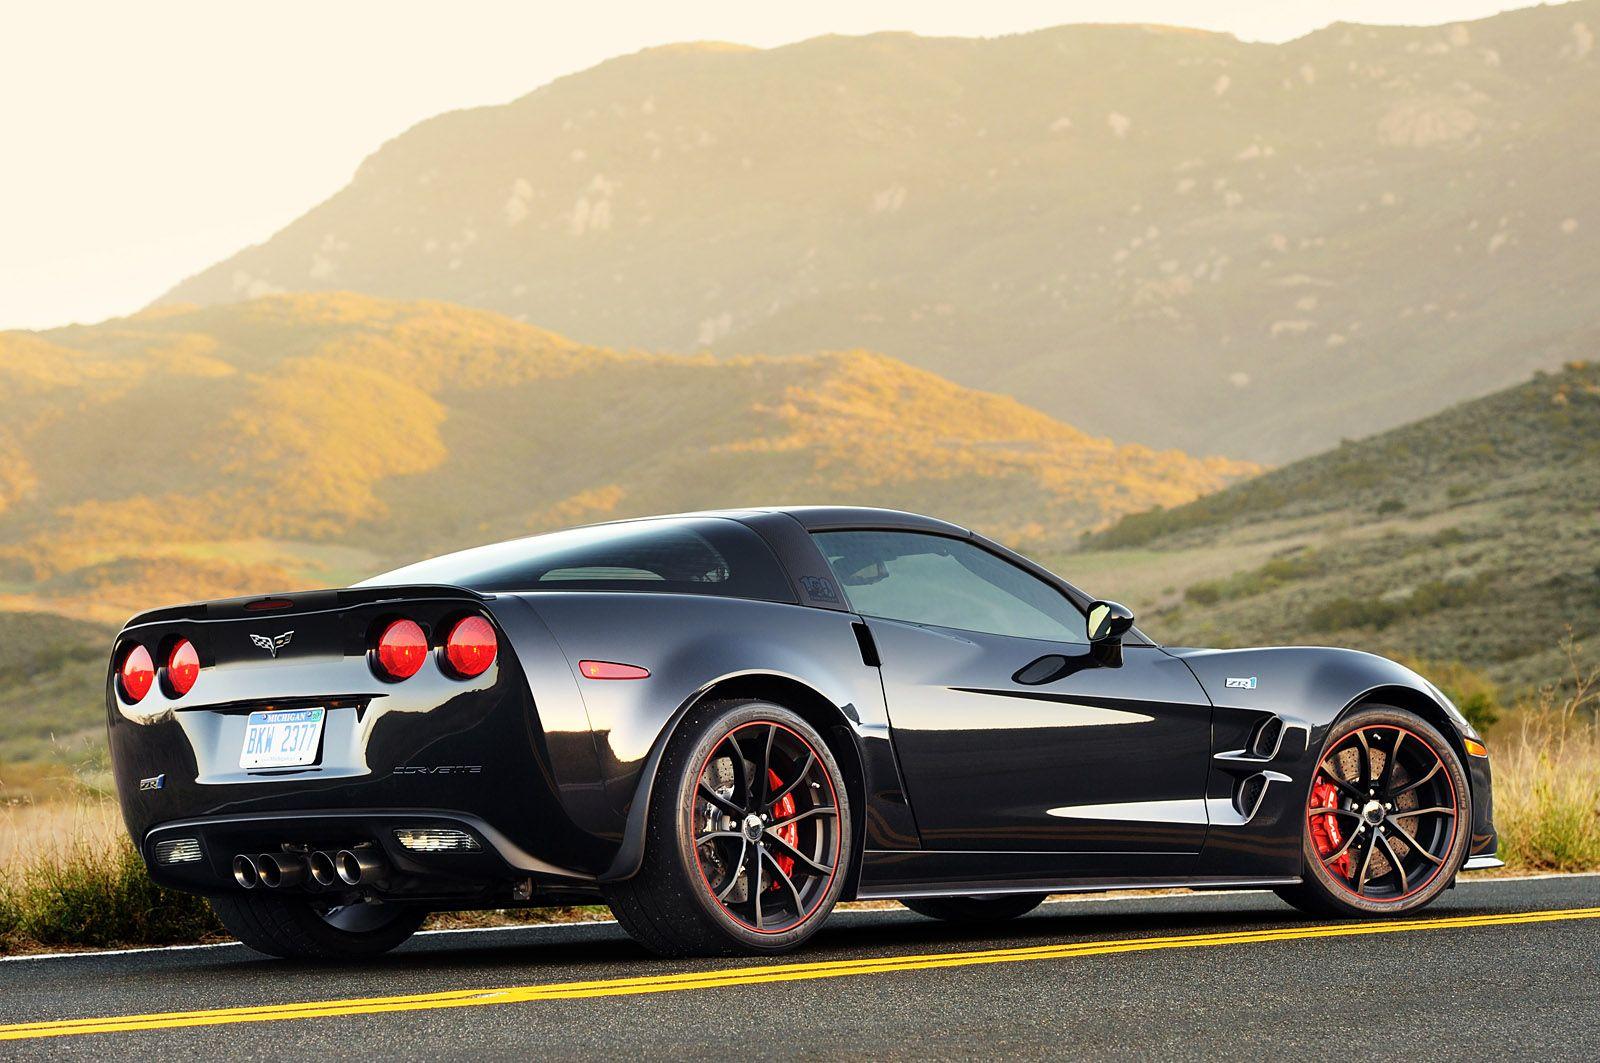 Delicieux Chevrolet Corvette Zr1 Modifications Wallpaper HD | Modification Of Cars |  Pinterest | Corvette Zr1, Chevrolet Corvette And Corvette